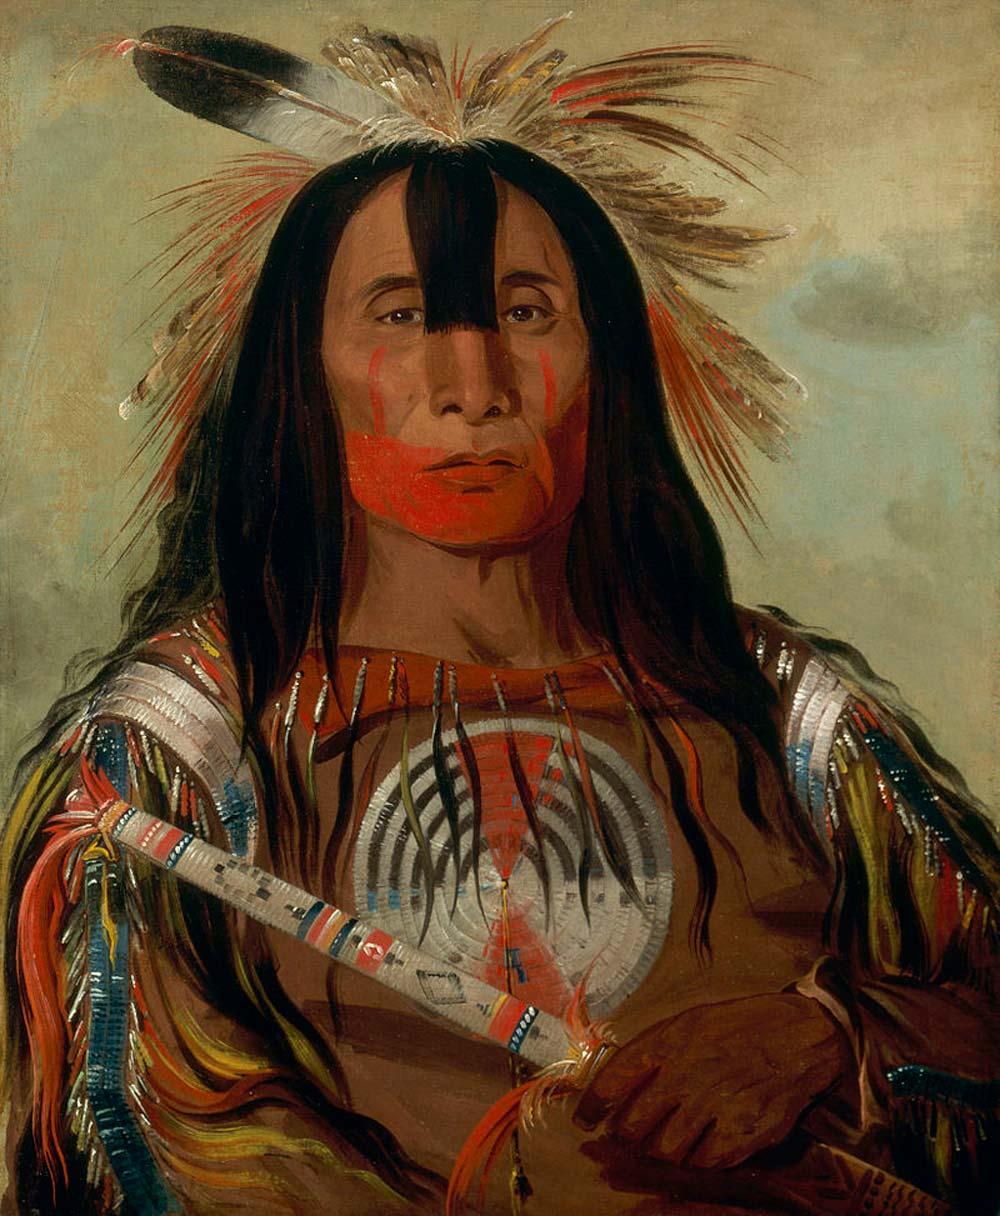 800px-George_Catlin_-_Buffalo_Bulls_Back_Fat_-_Smithsonian_resize.jpg